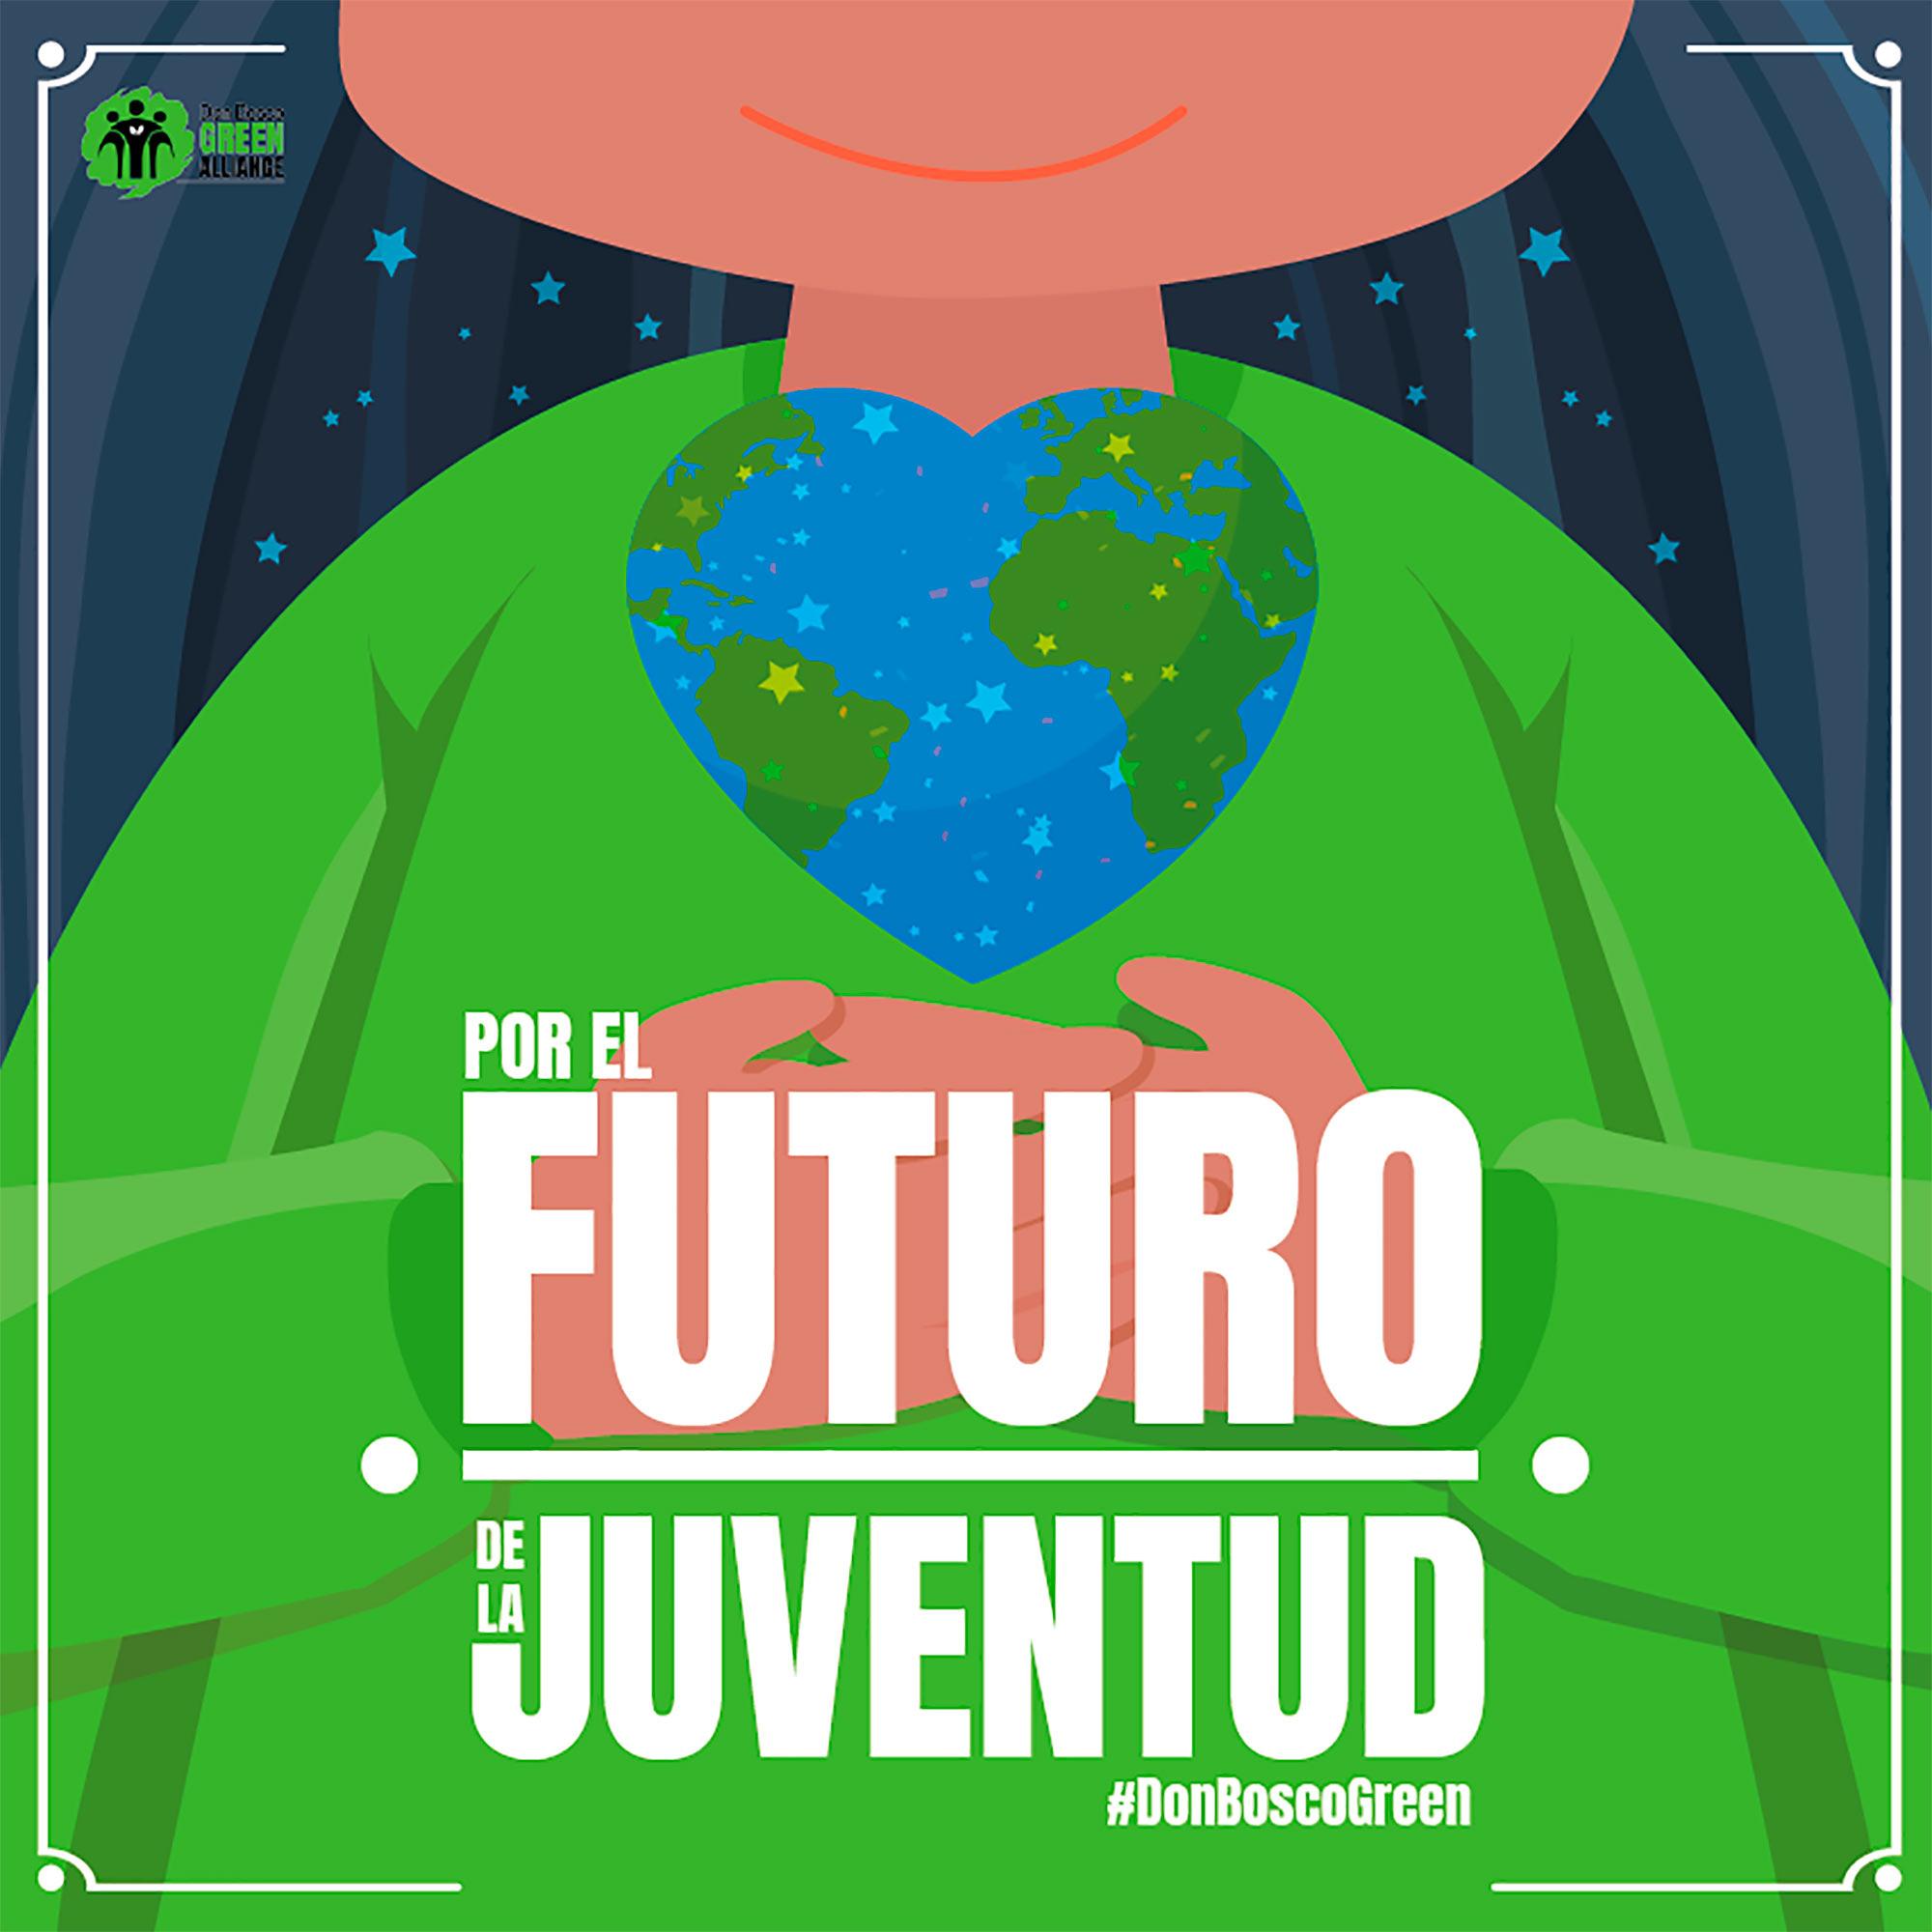 Don Bosco Green Alliance: Por el Futuro de la Juventud